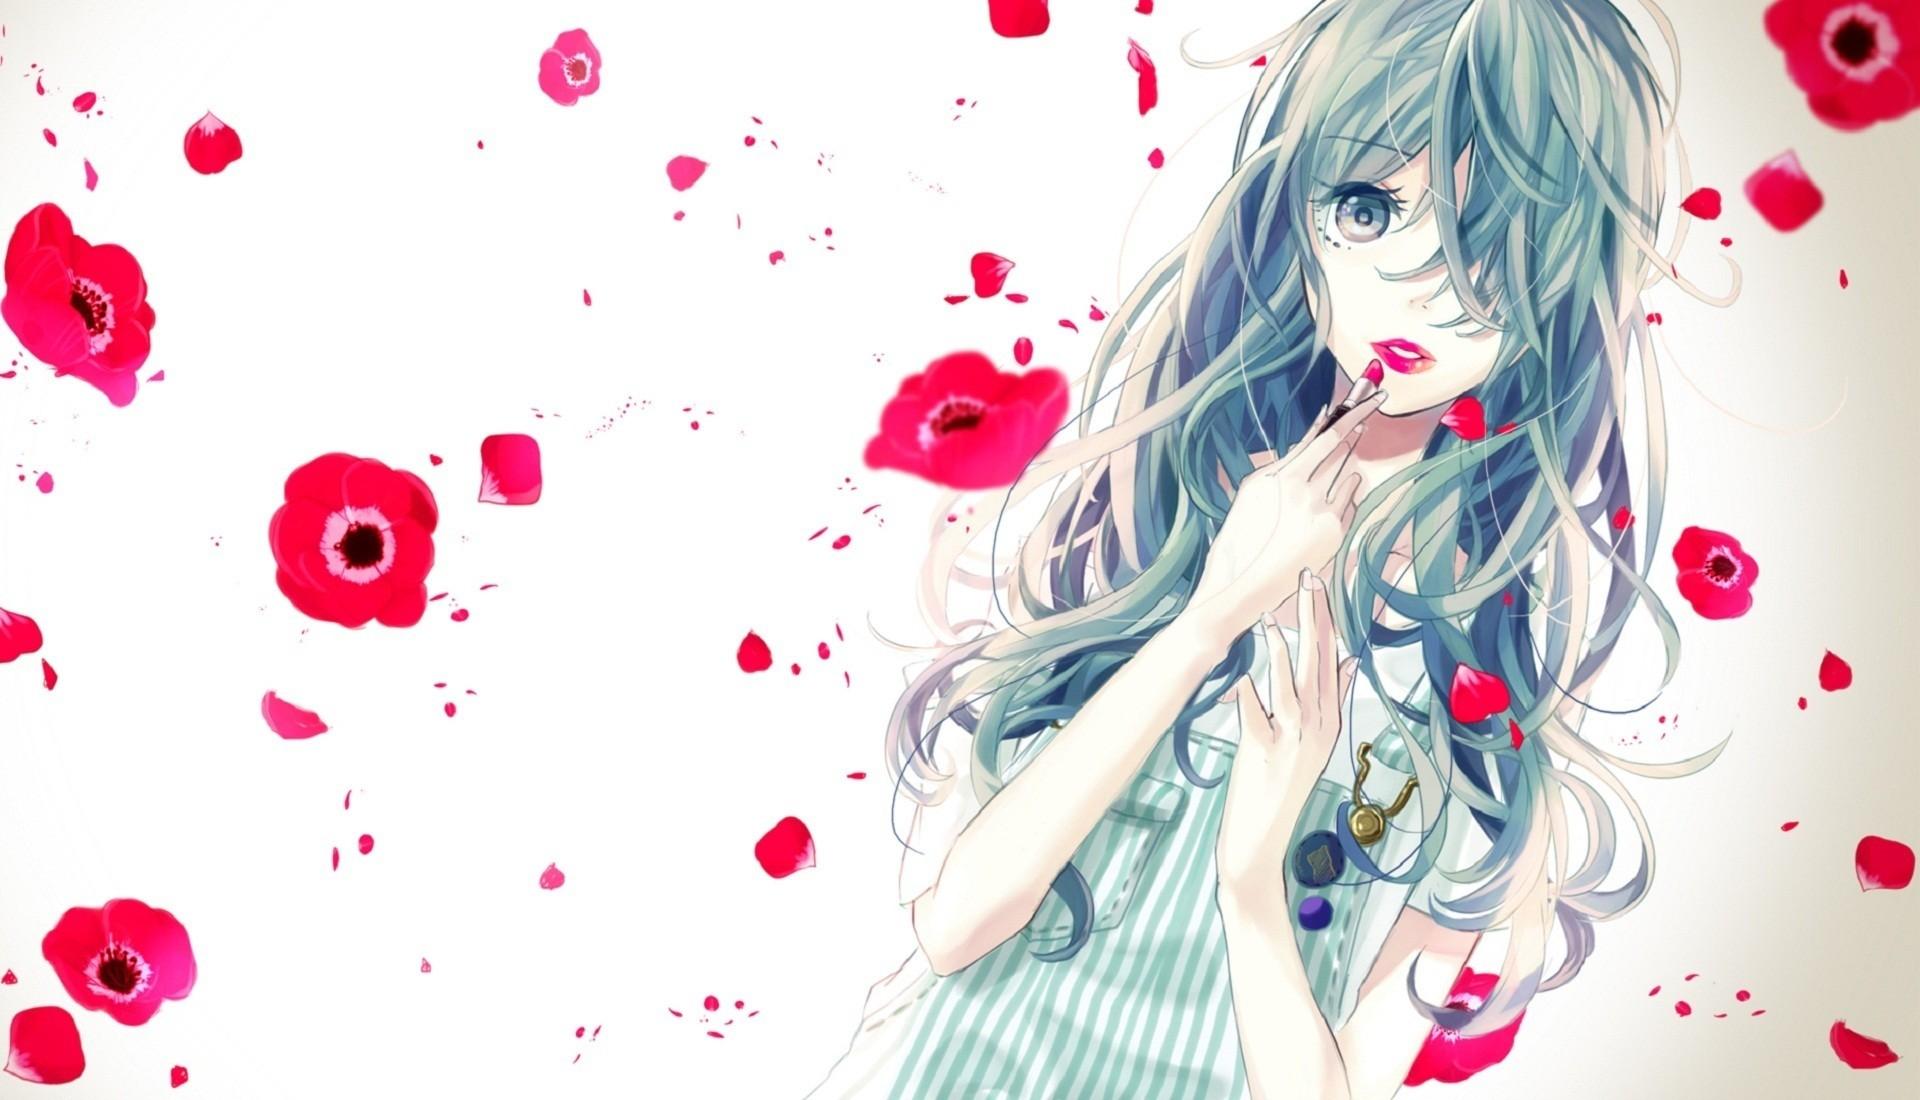 Anime Cuteness | … stuffpoint anime anime manga images wallpapers cute  manga tweet | CUTE…NESSSSS | Pinterest | Manga, Manga anime and Anime